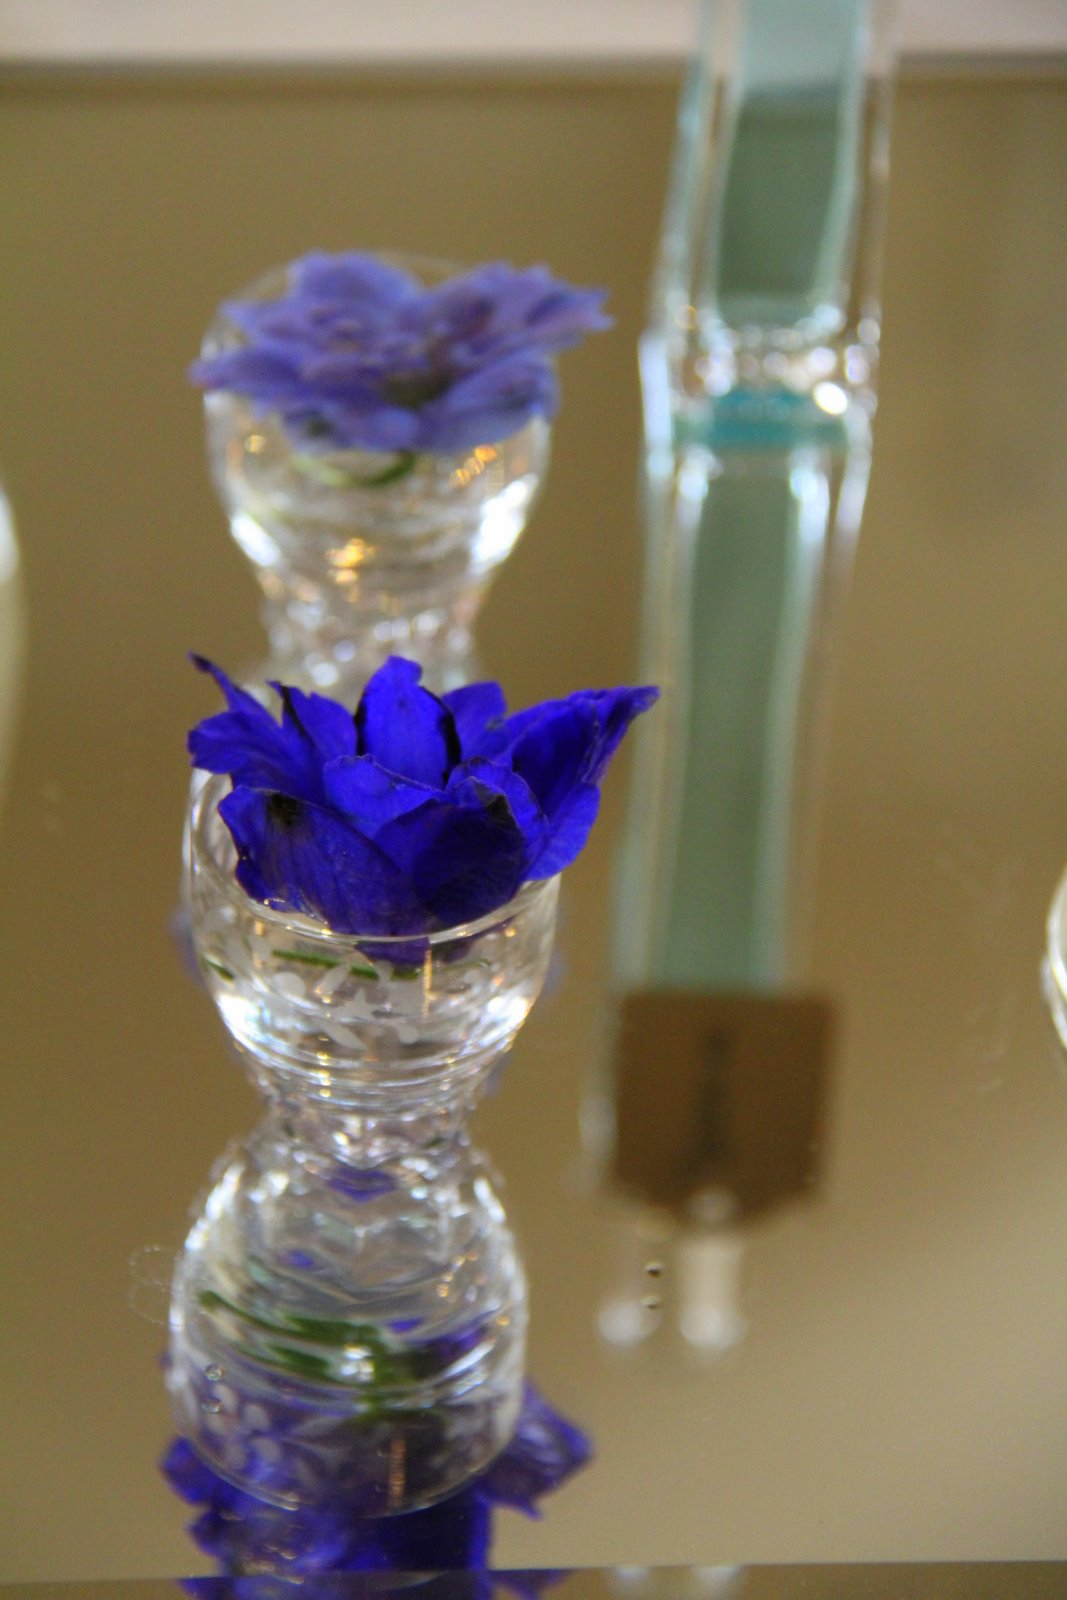 Flower design table centrepieces vintage glass bottles for Flowers in glass bottles